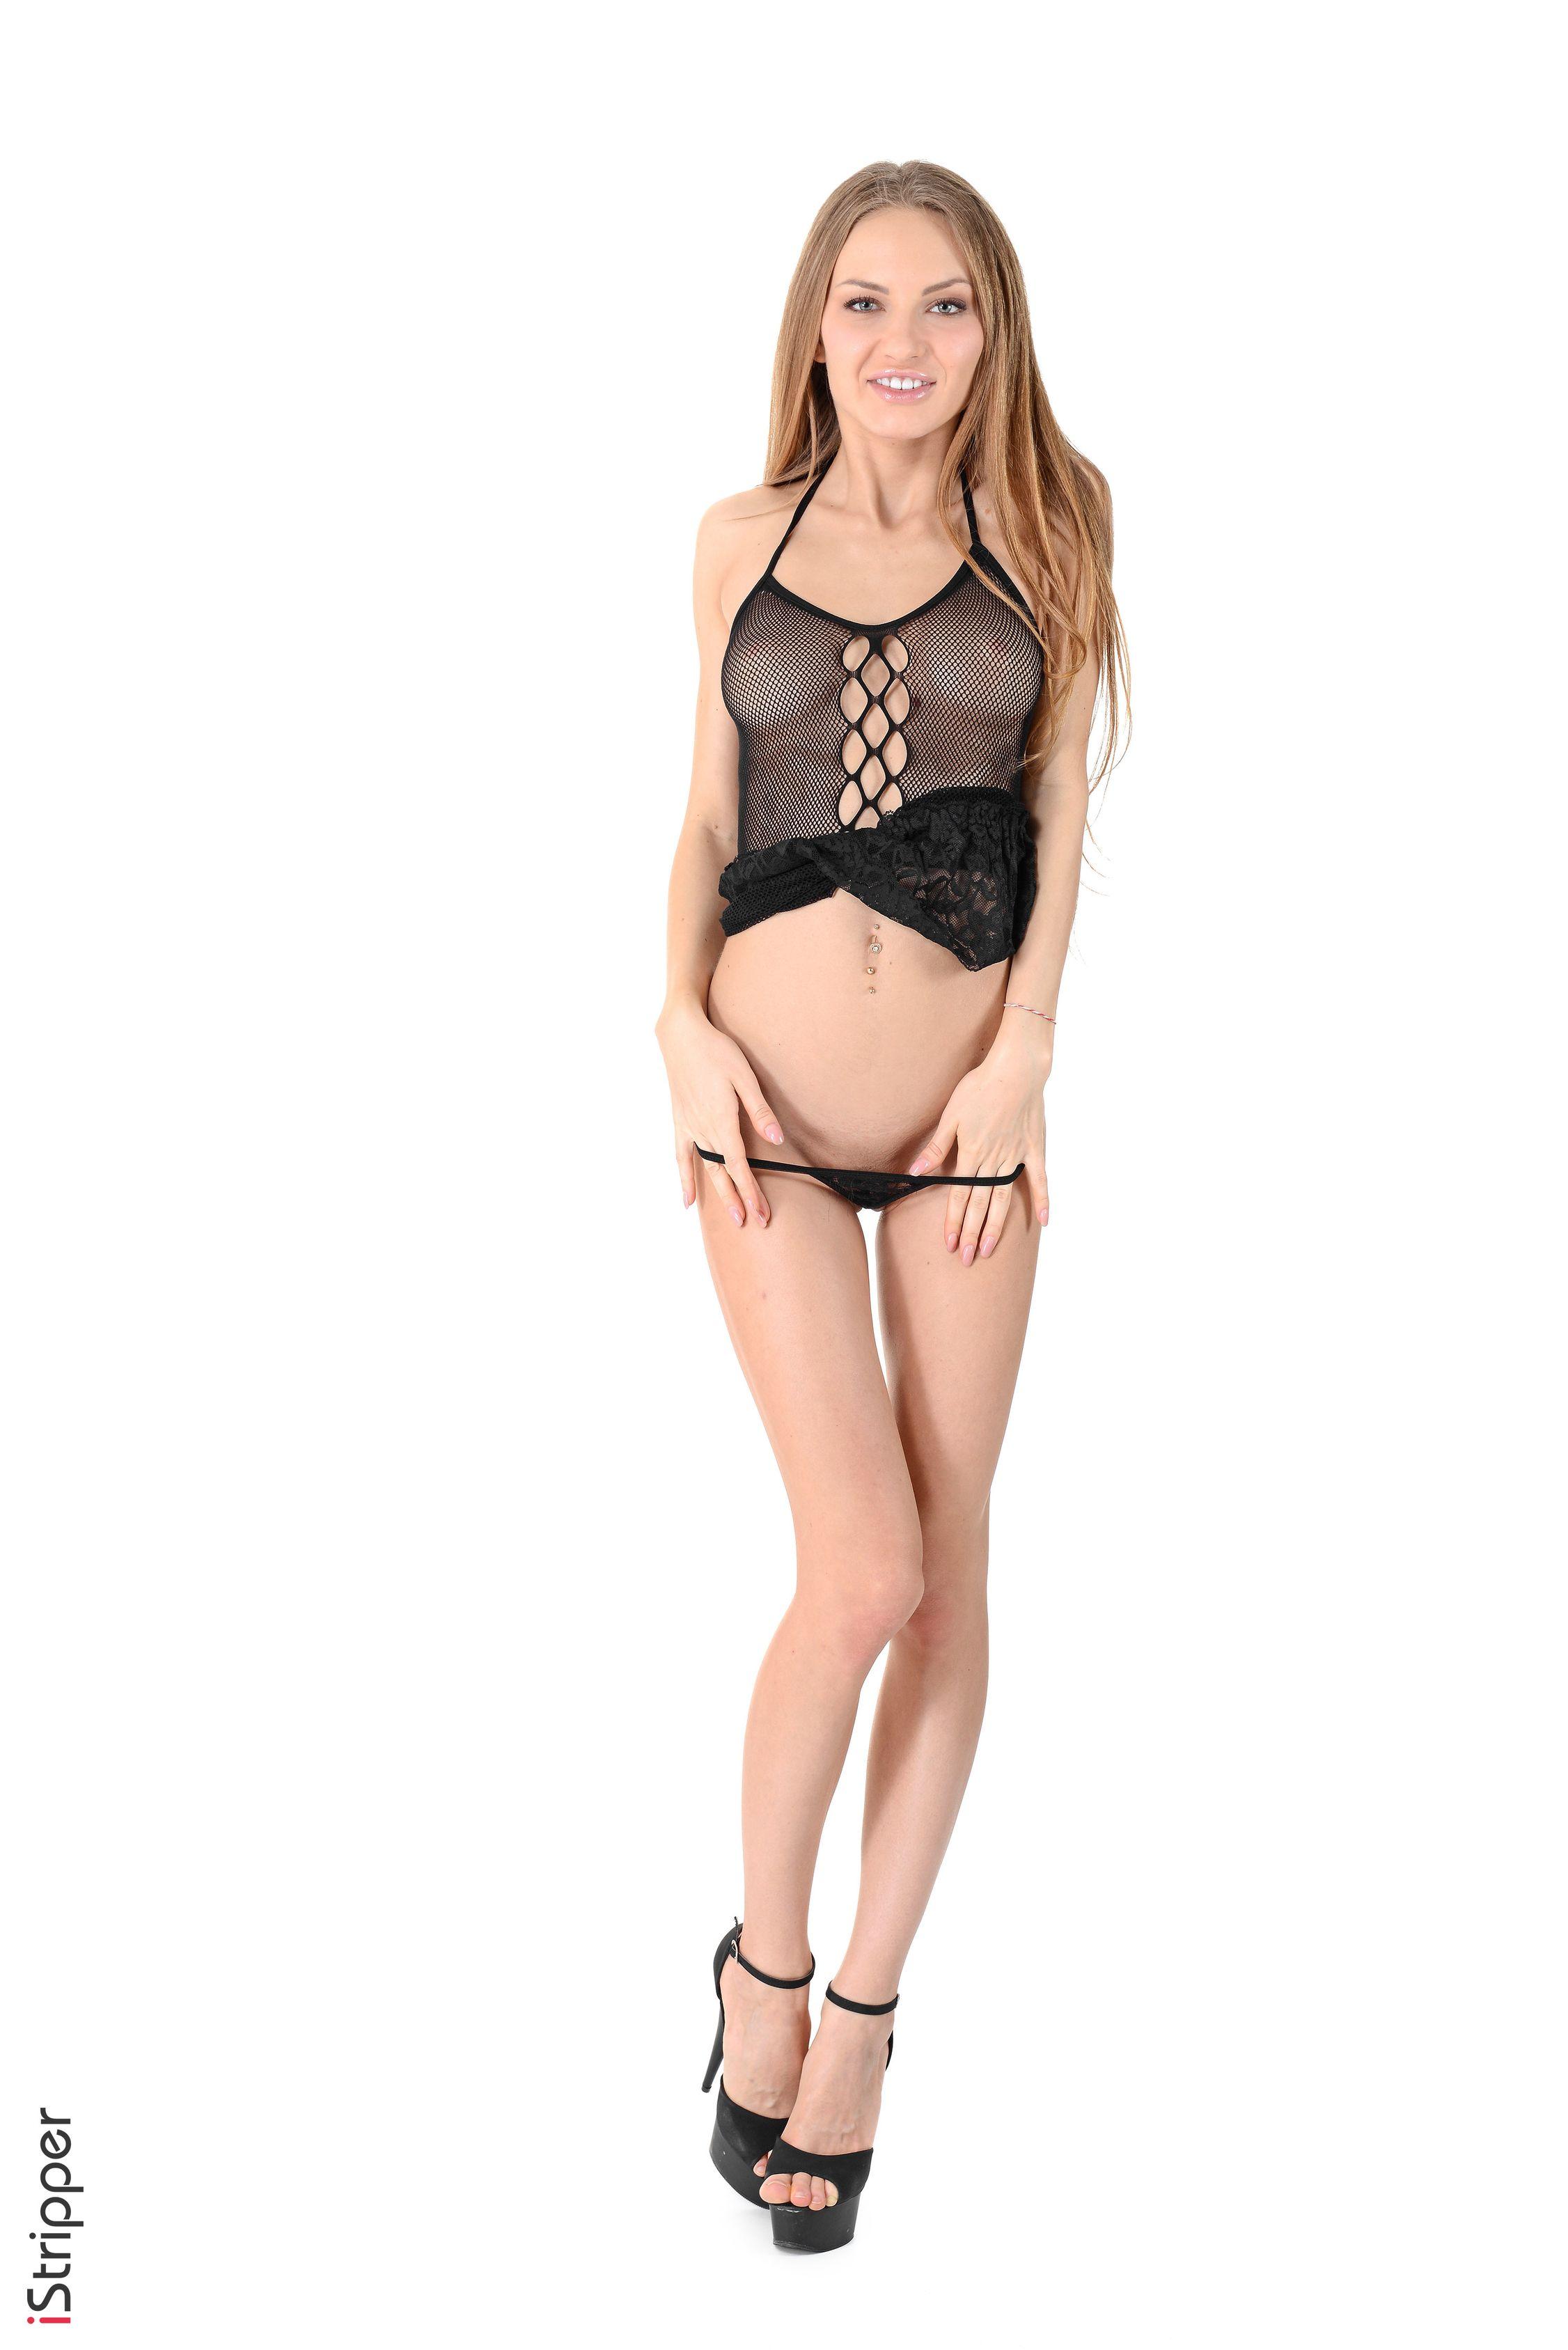 Raven riley mini skirt sexy